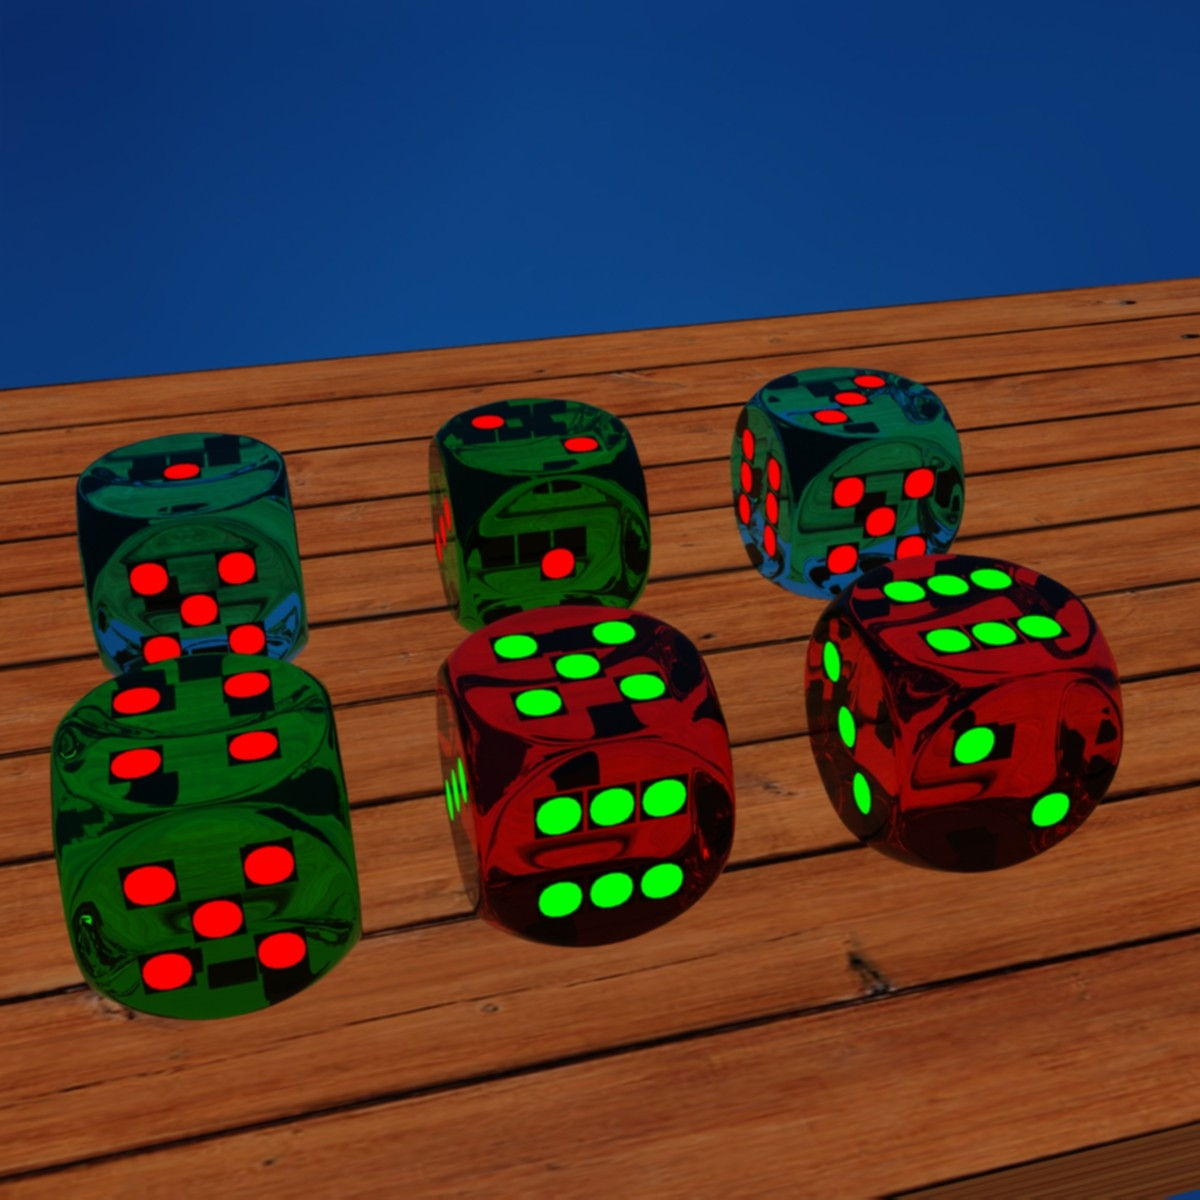 color_dice1.jpg